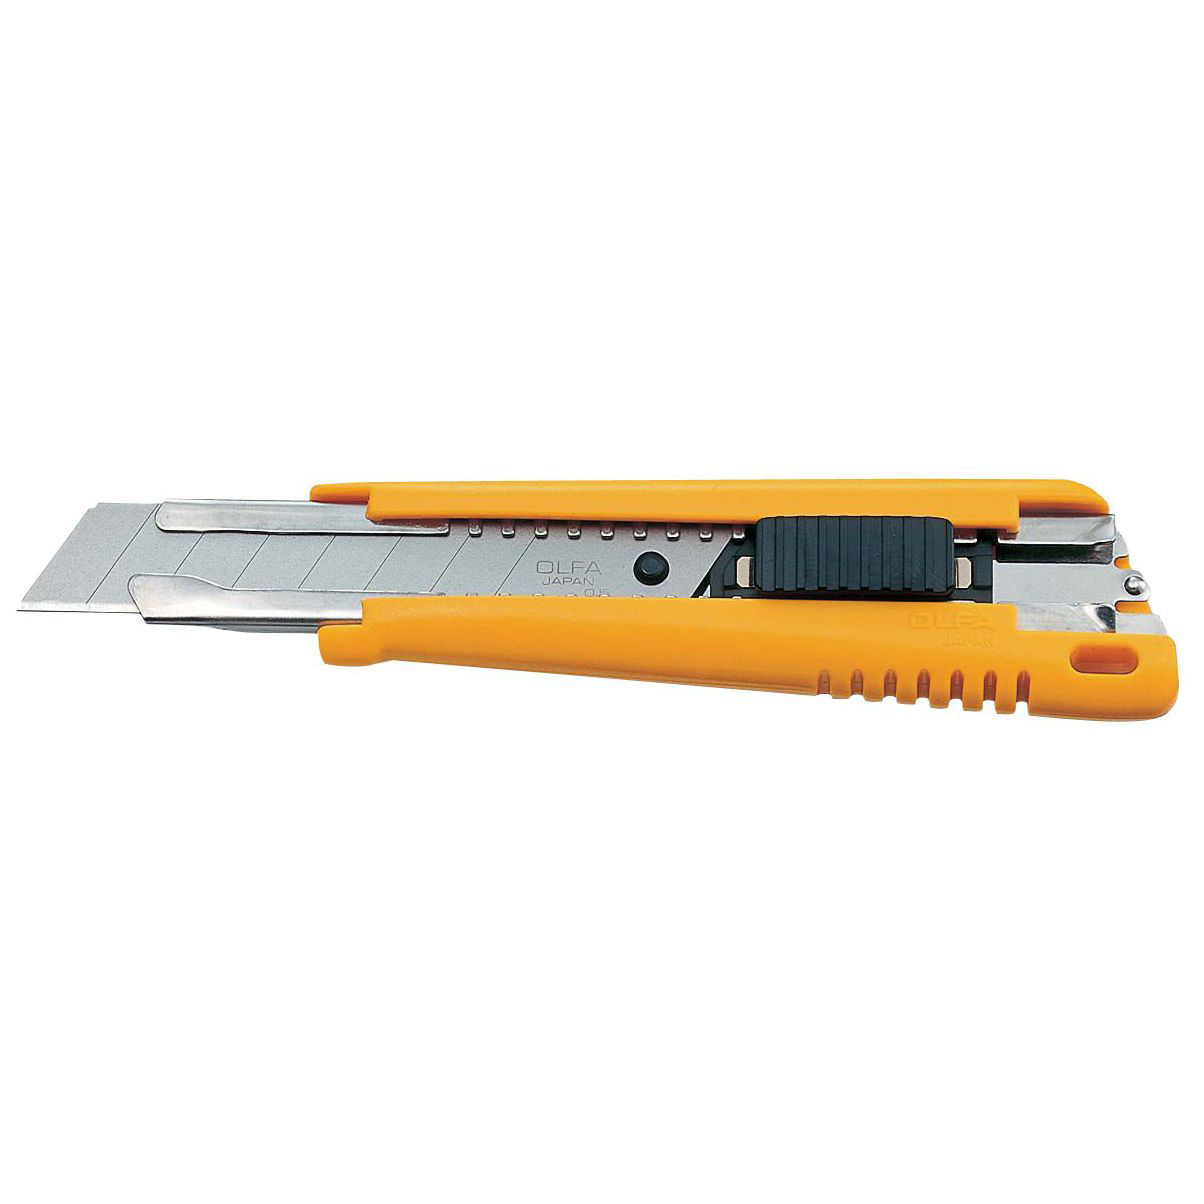 Olfa EXL heavy duty cutter with auto lock mechanism